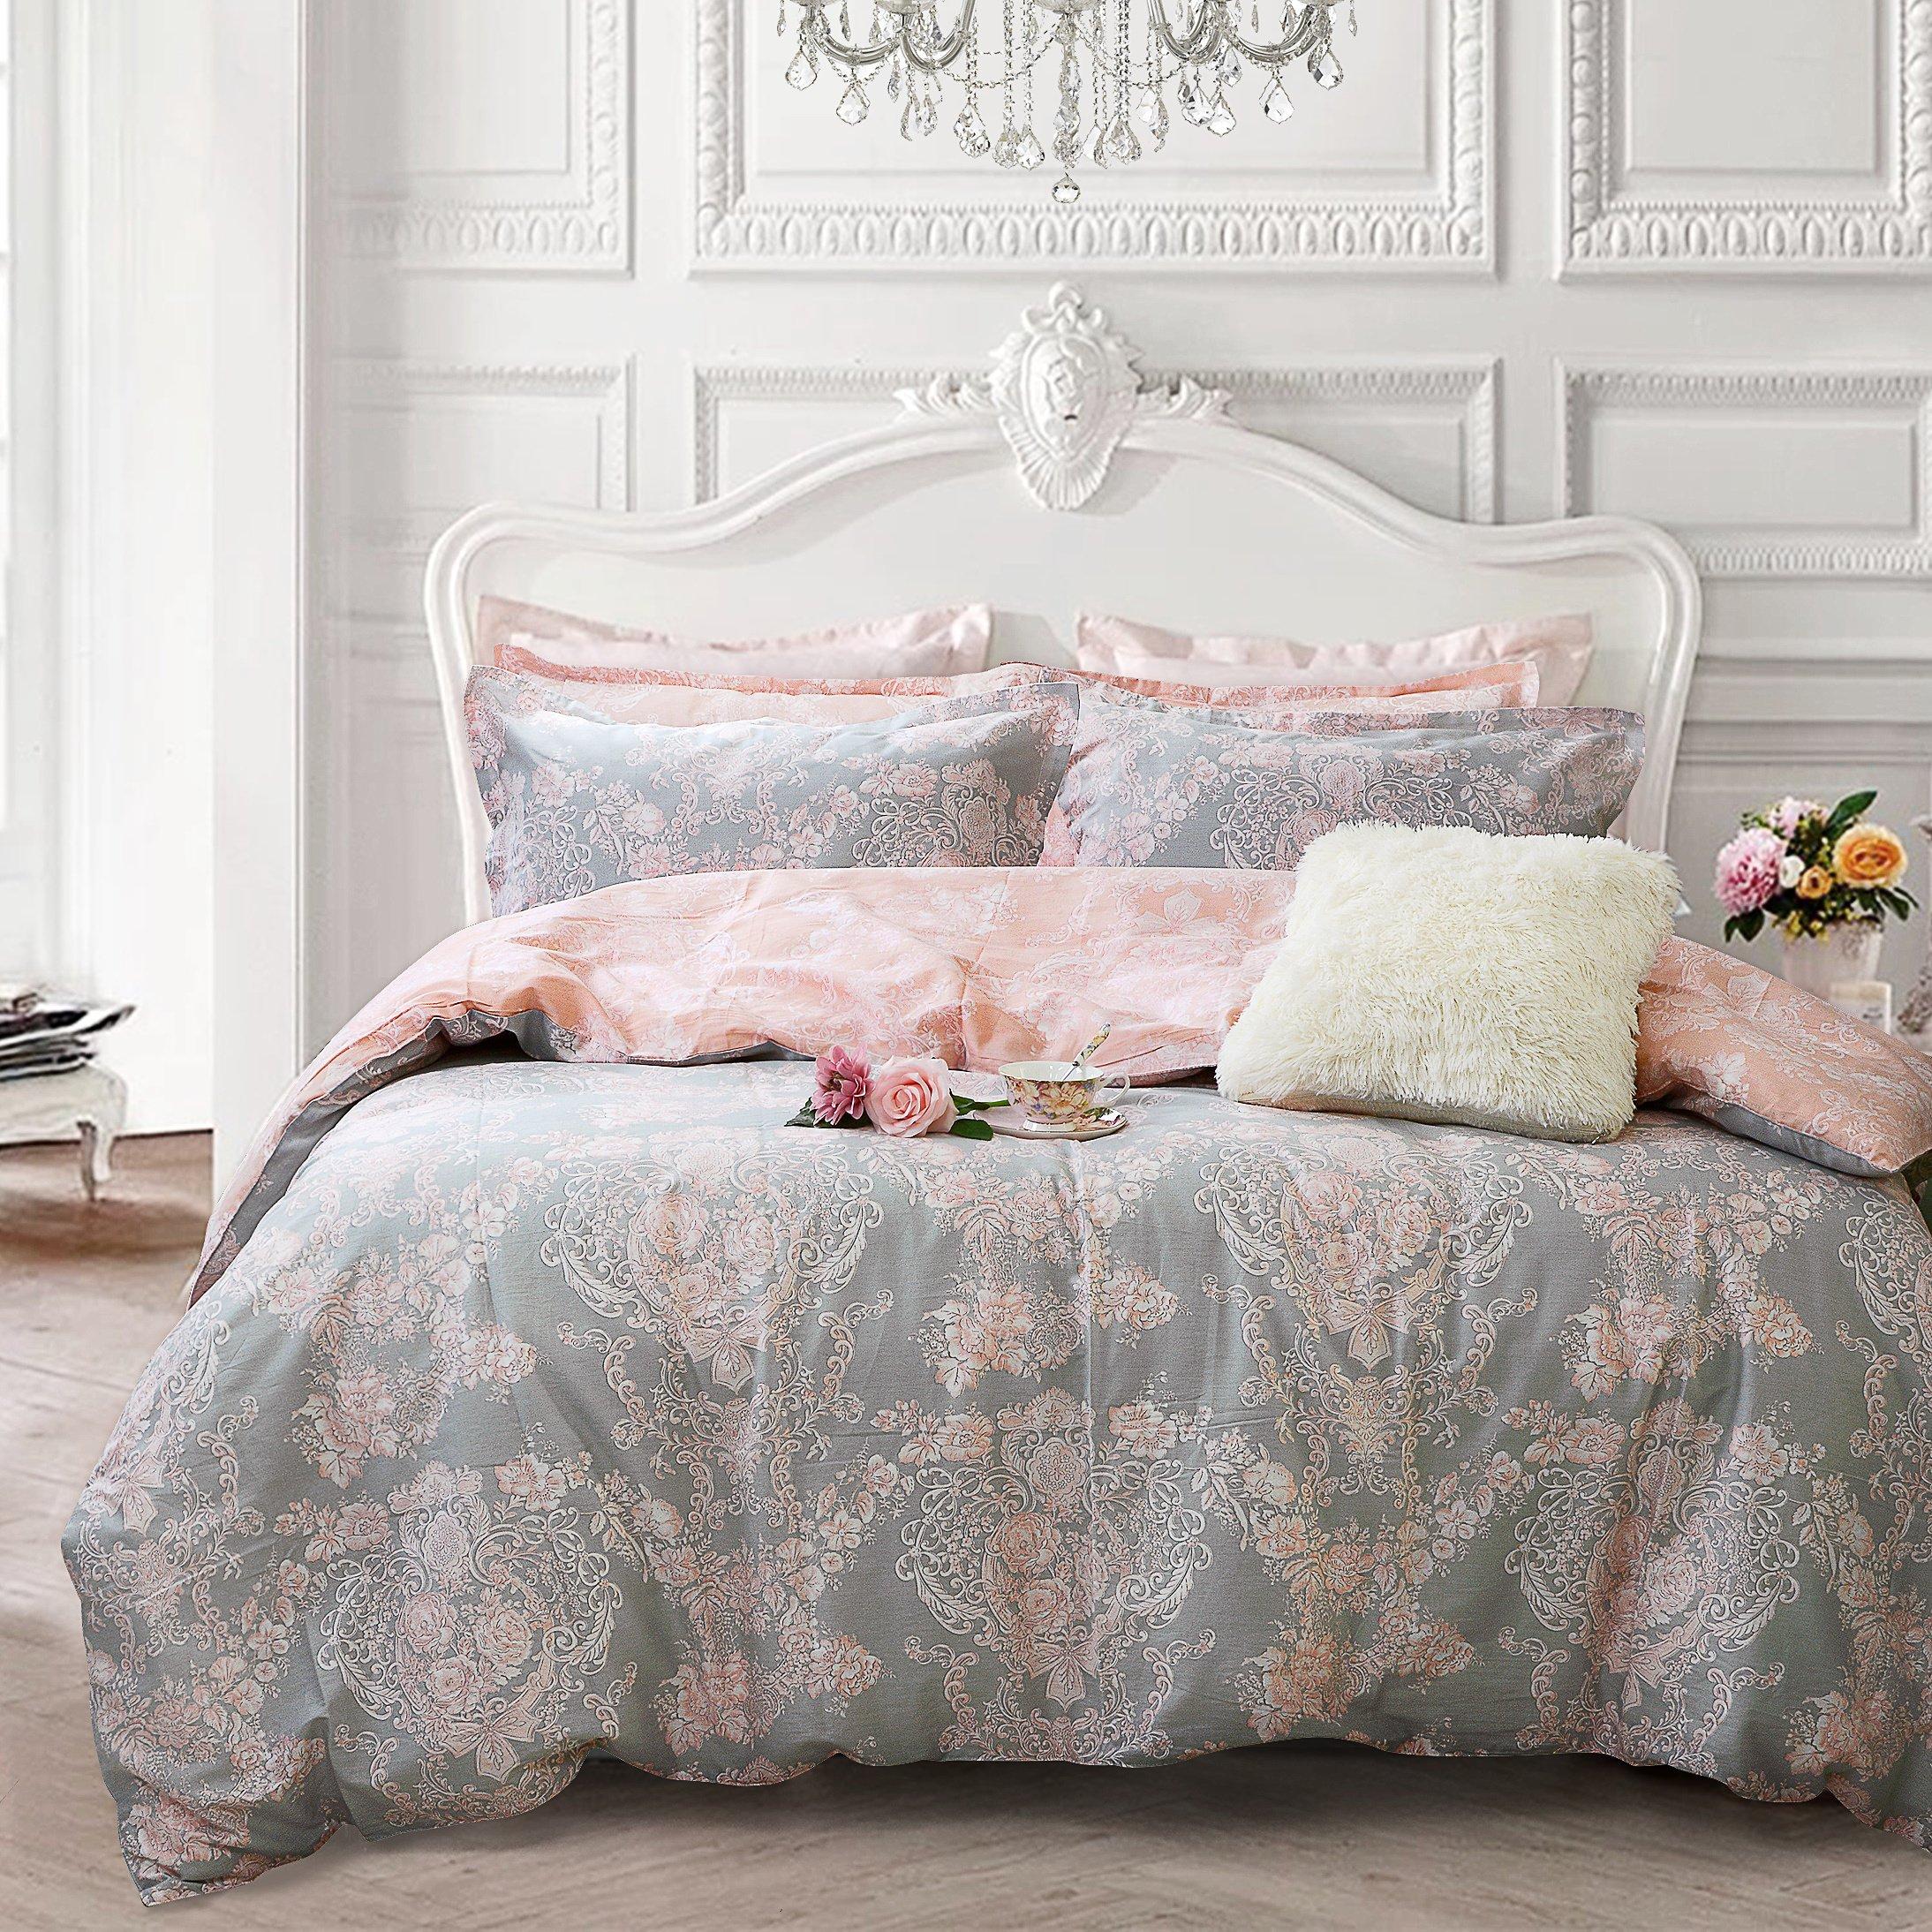 Brandream Blush Pink Bedding Sets Queen Size Girls Damask Flower Bedding 100% Cotton Duvet Cover Set 3-Piece(Comforter not Included)